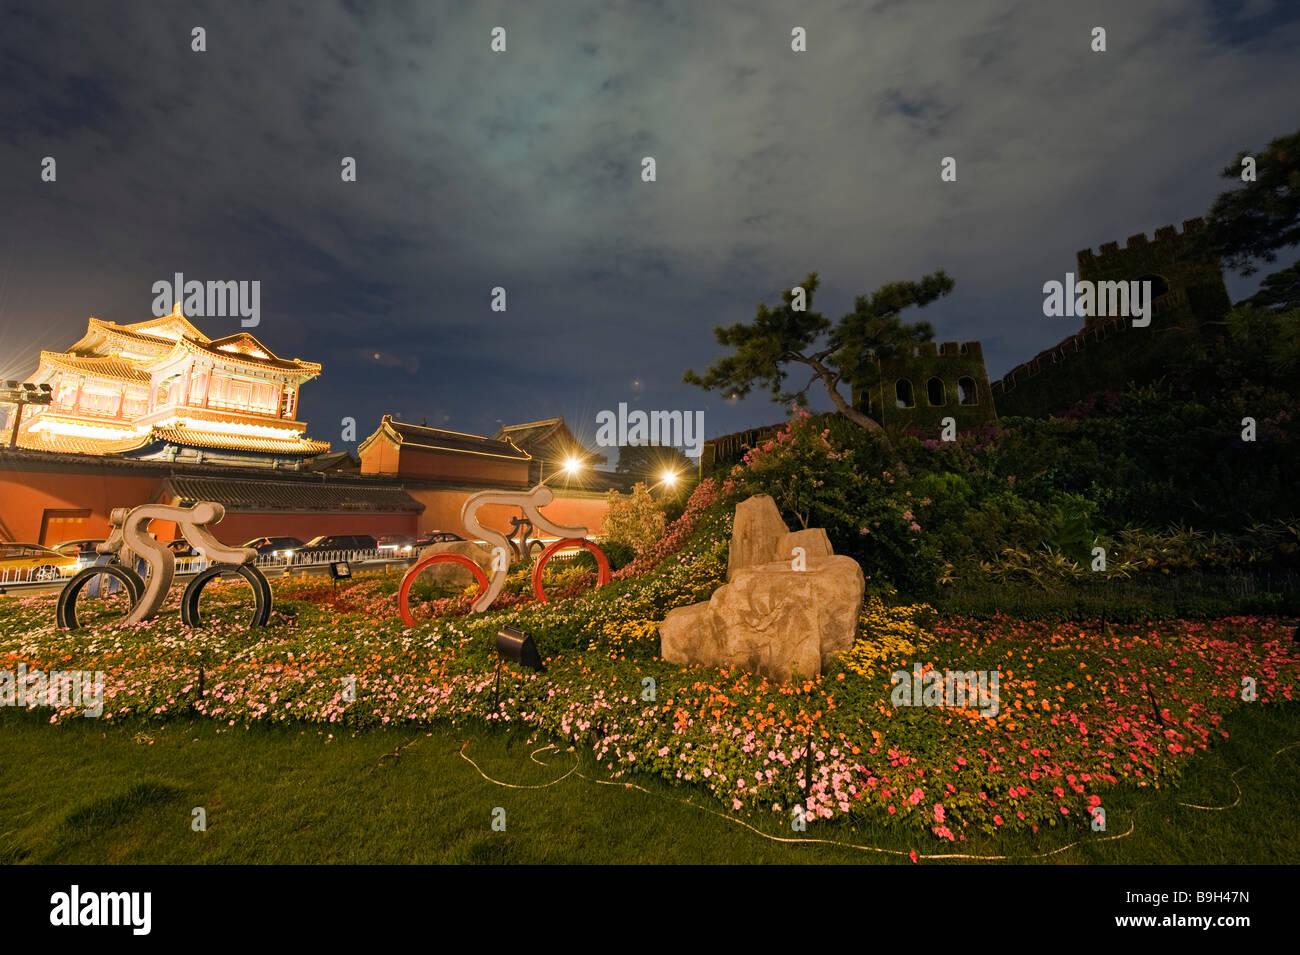 China, Beijing, Yonghegong district. Lama temple and Great Wall of China display - Stock Image